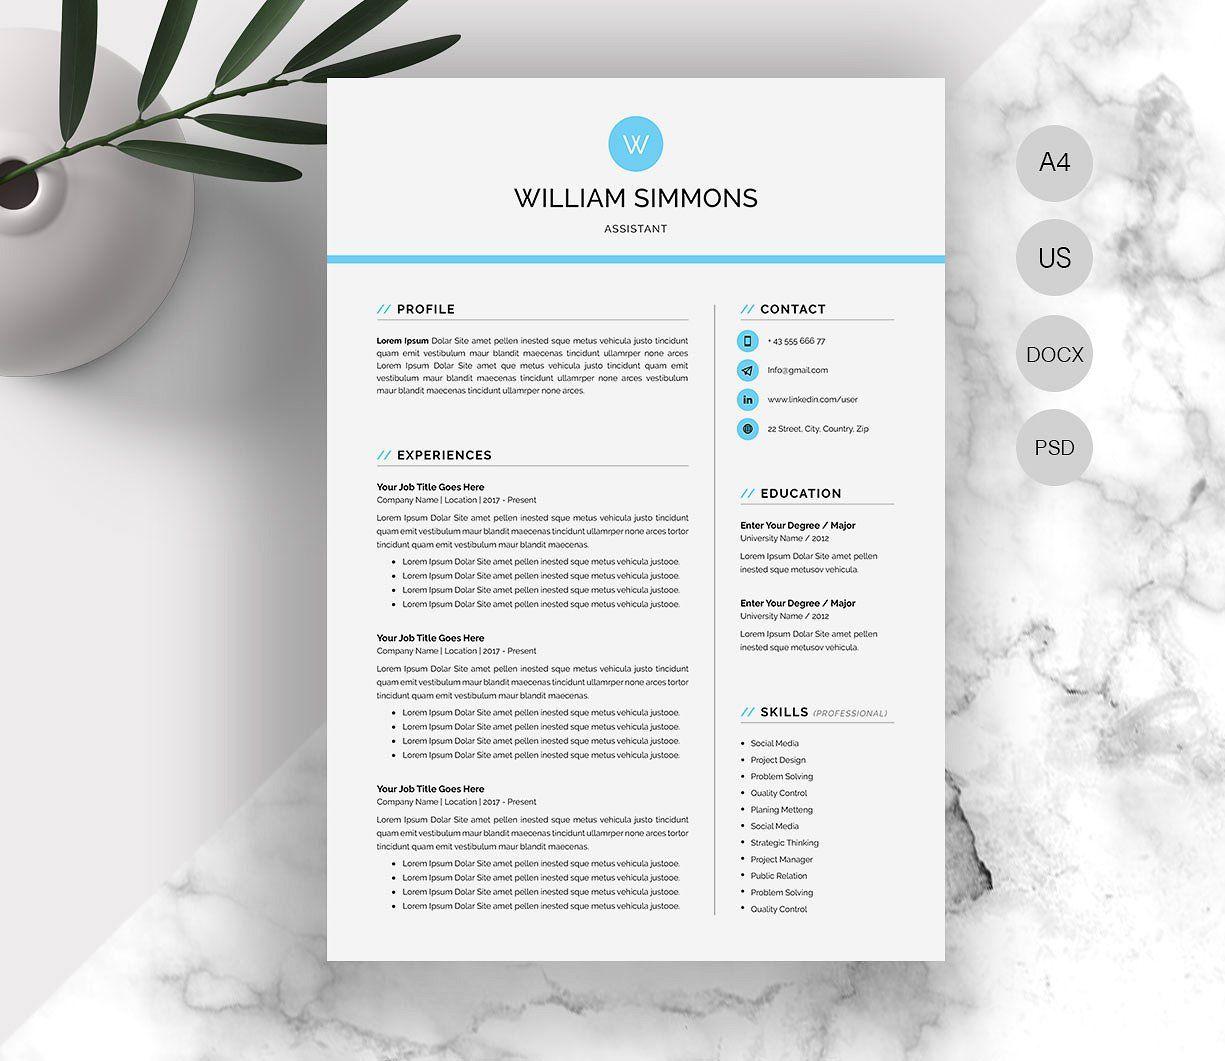 Word Resume Cv Resume Design Template Resume Cv Creative Resume Templates